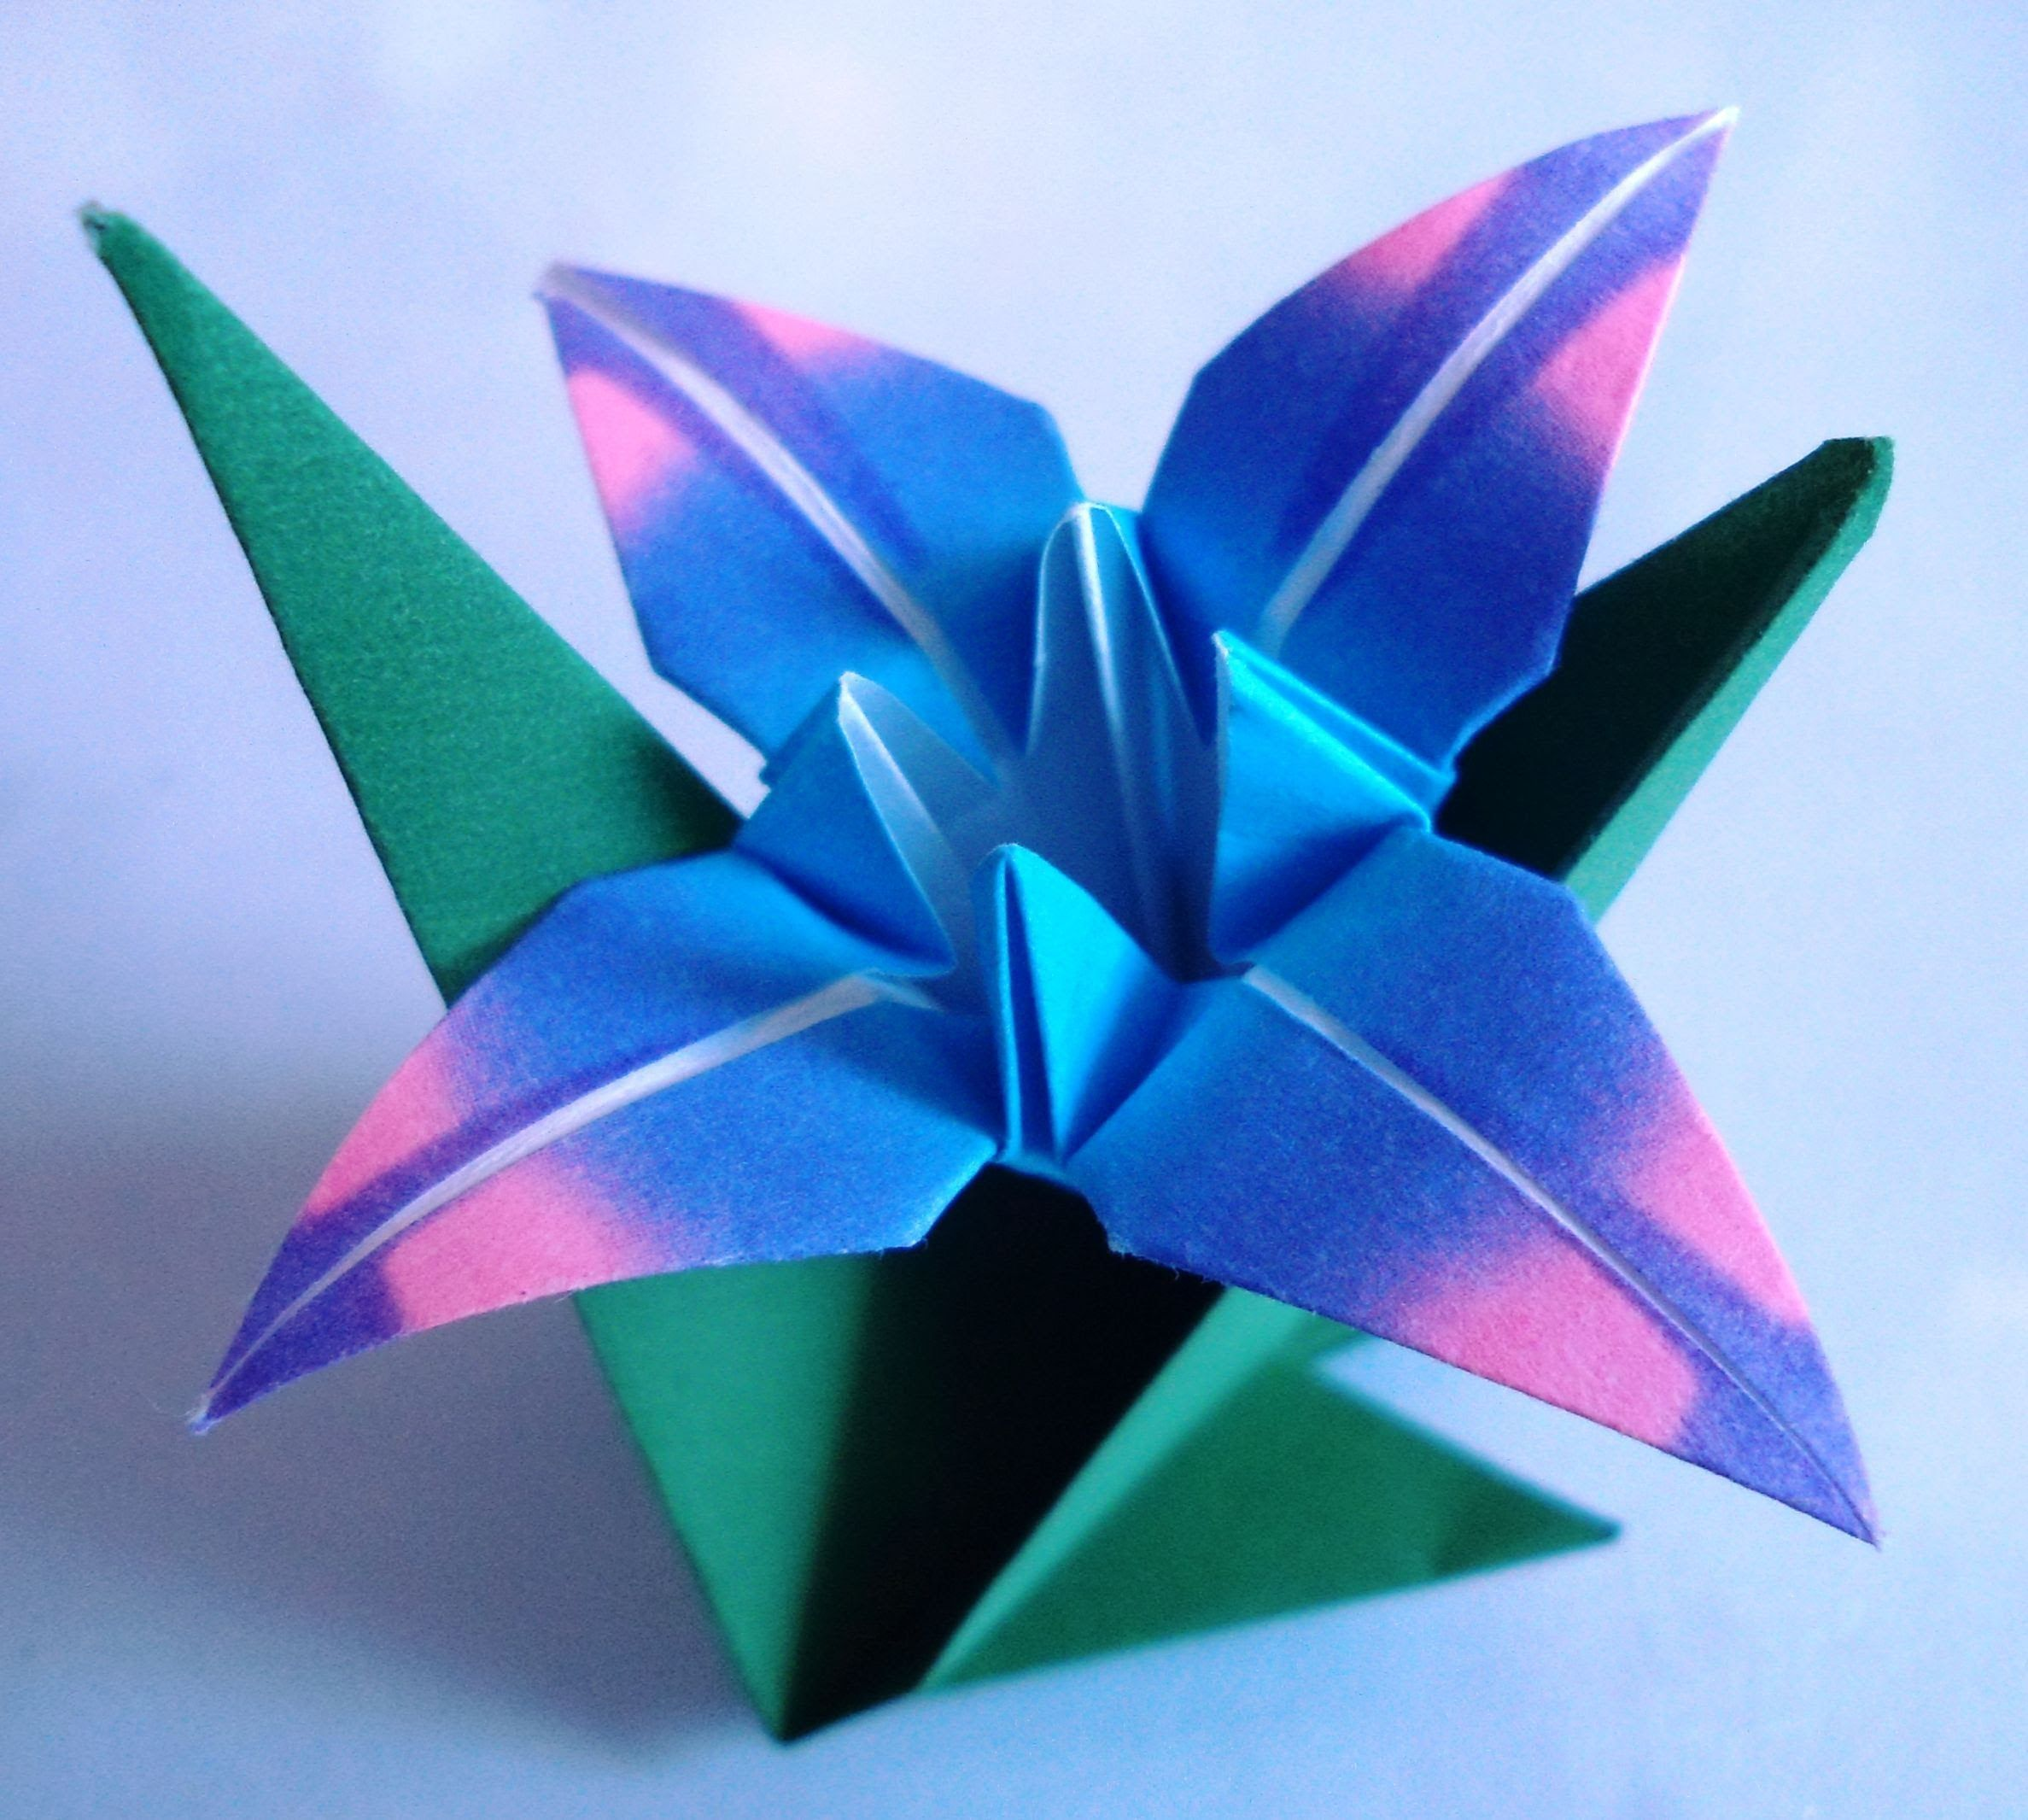 Pin By Dan Dan On Beautiful Origami Pinterest Origami Origami